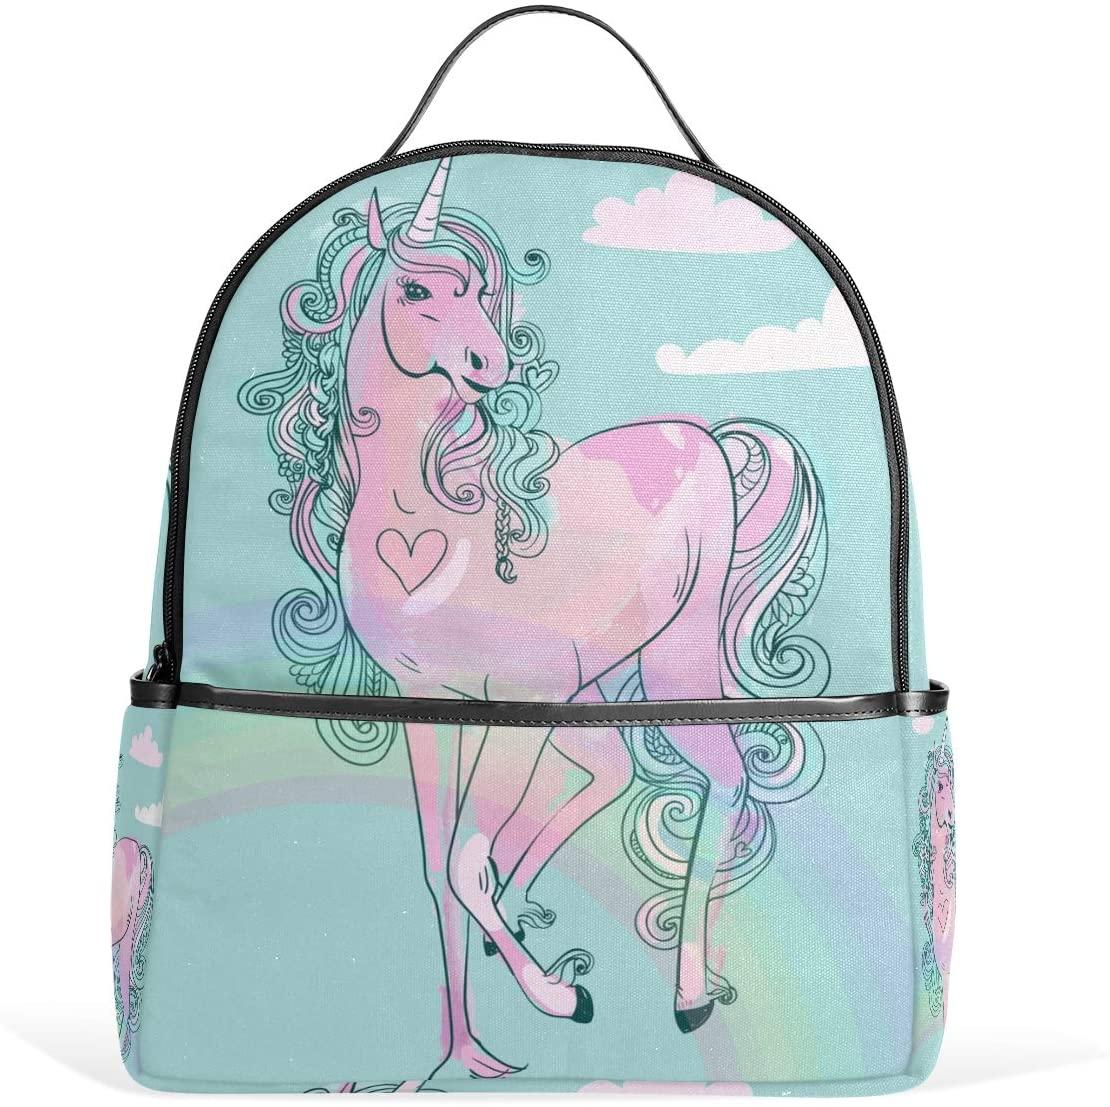 Kids School Backpack Fairytale Unicorn Bookbag for Boys Girls Lightweight Casual Travel Bag Large Capacity Daypack